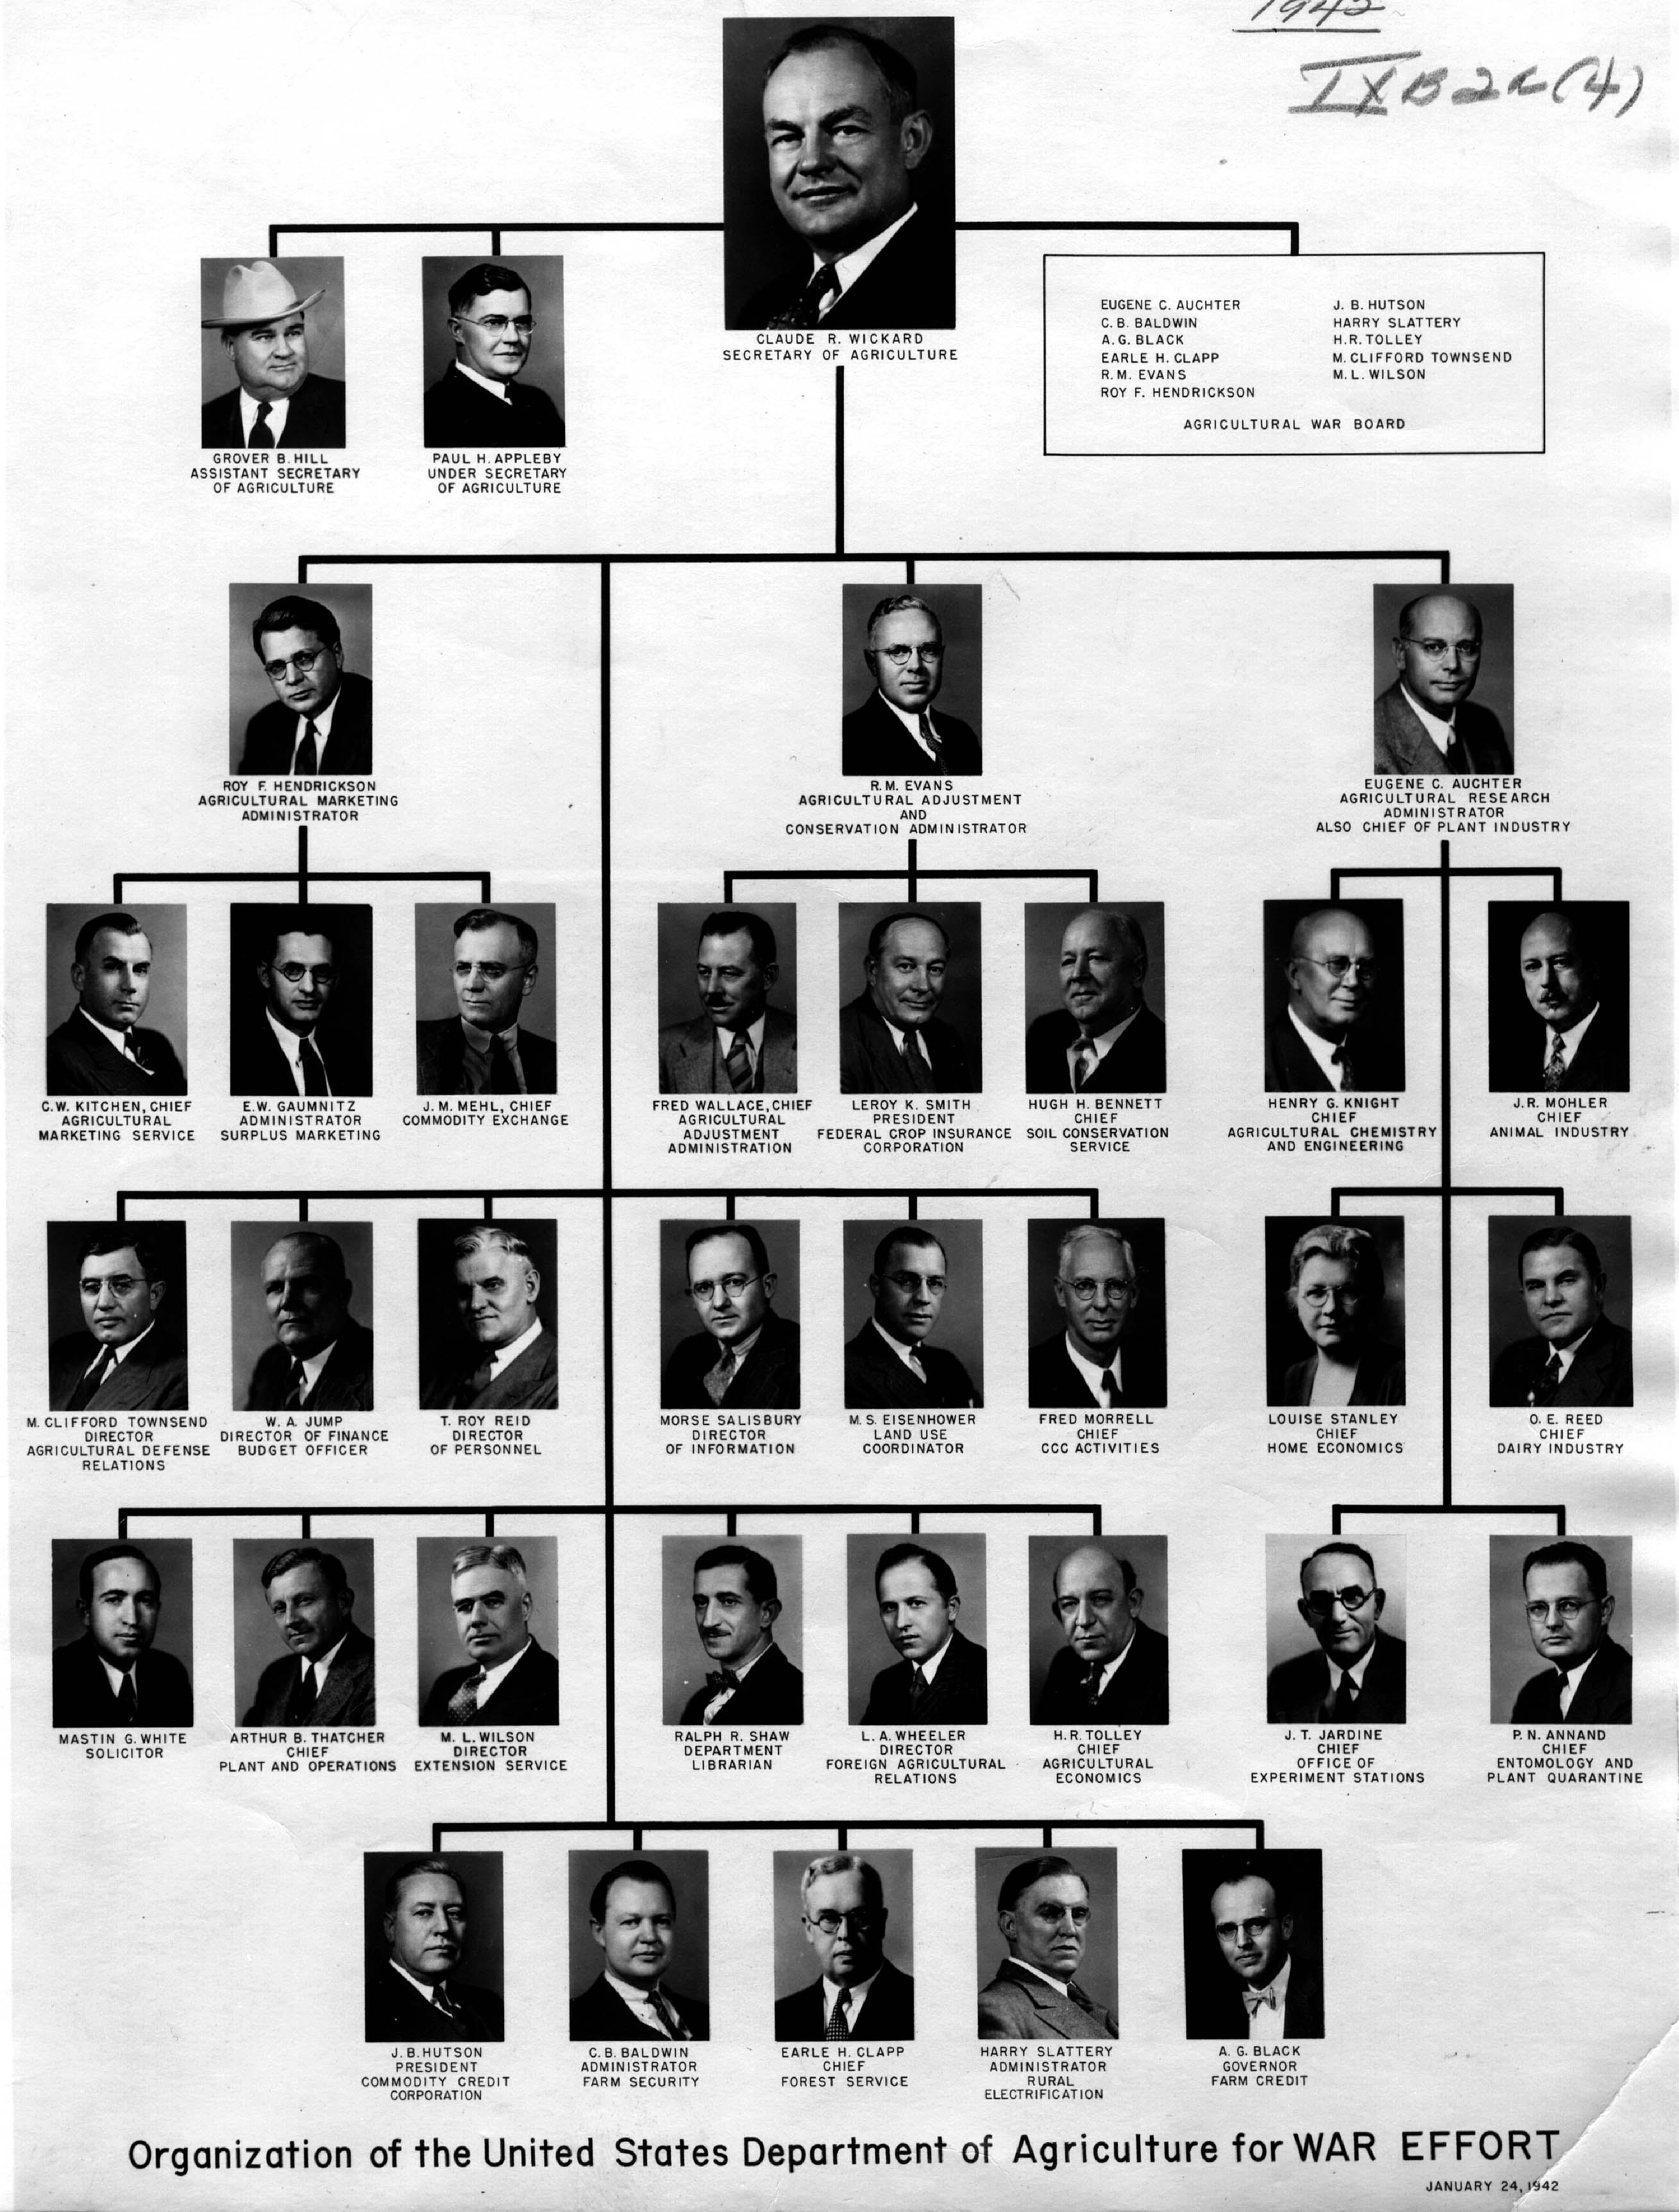 Usda Organization Chart 1942